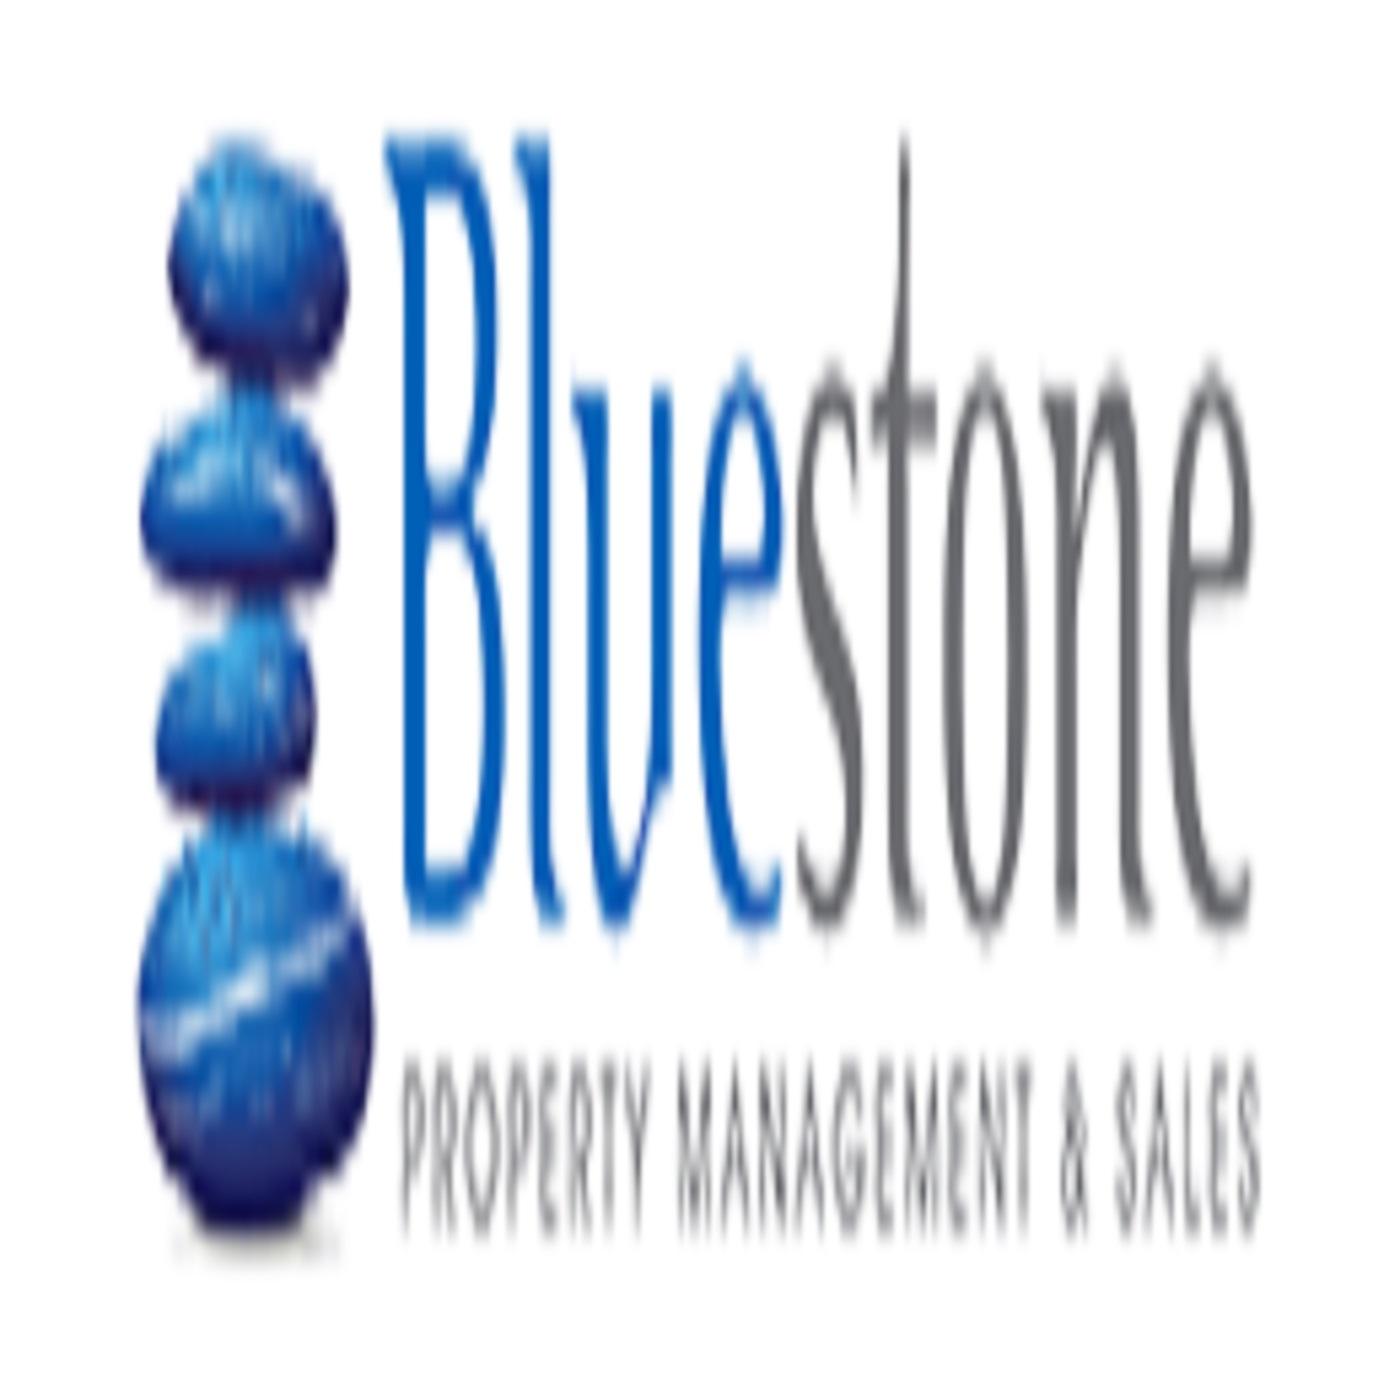 Bluestone Property Management & Sales